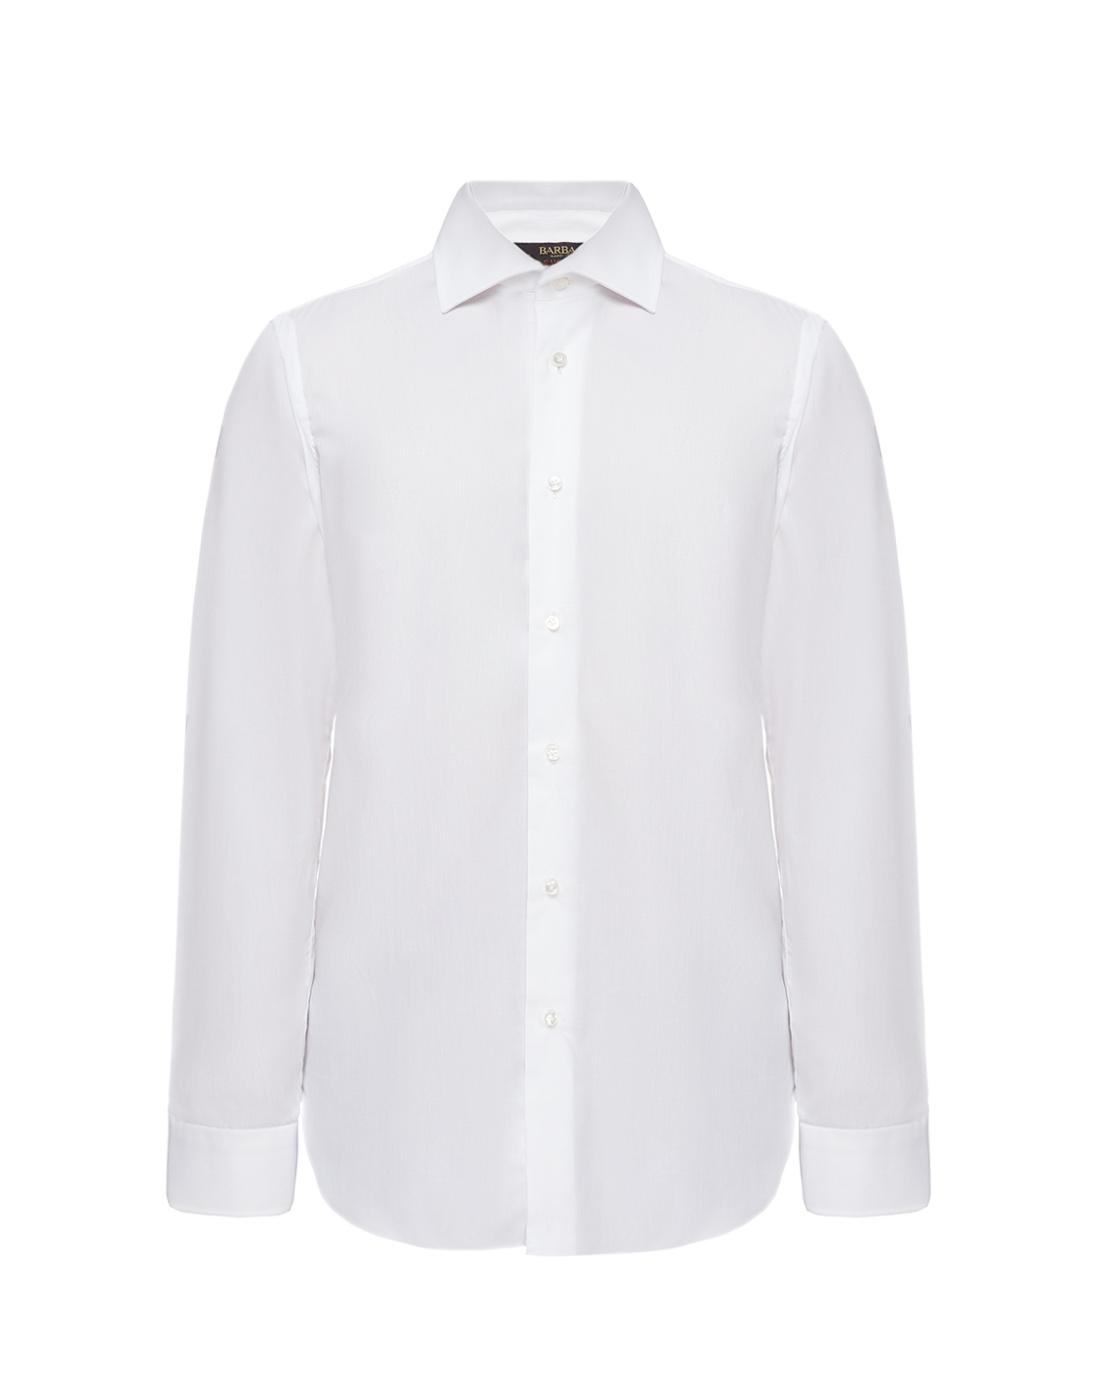 Мужская белая рубашка Barba SD2U634540301U-1